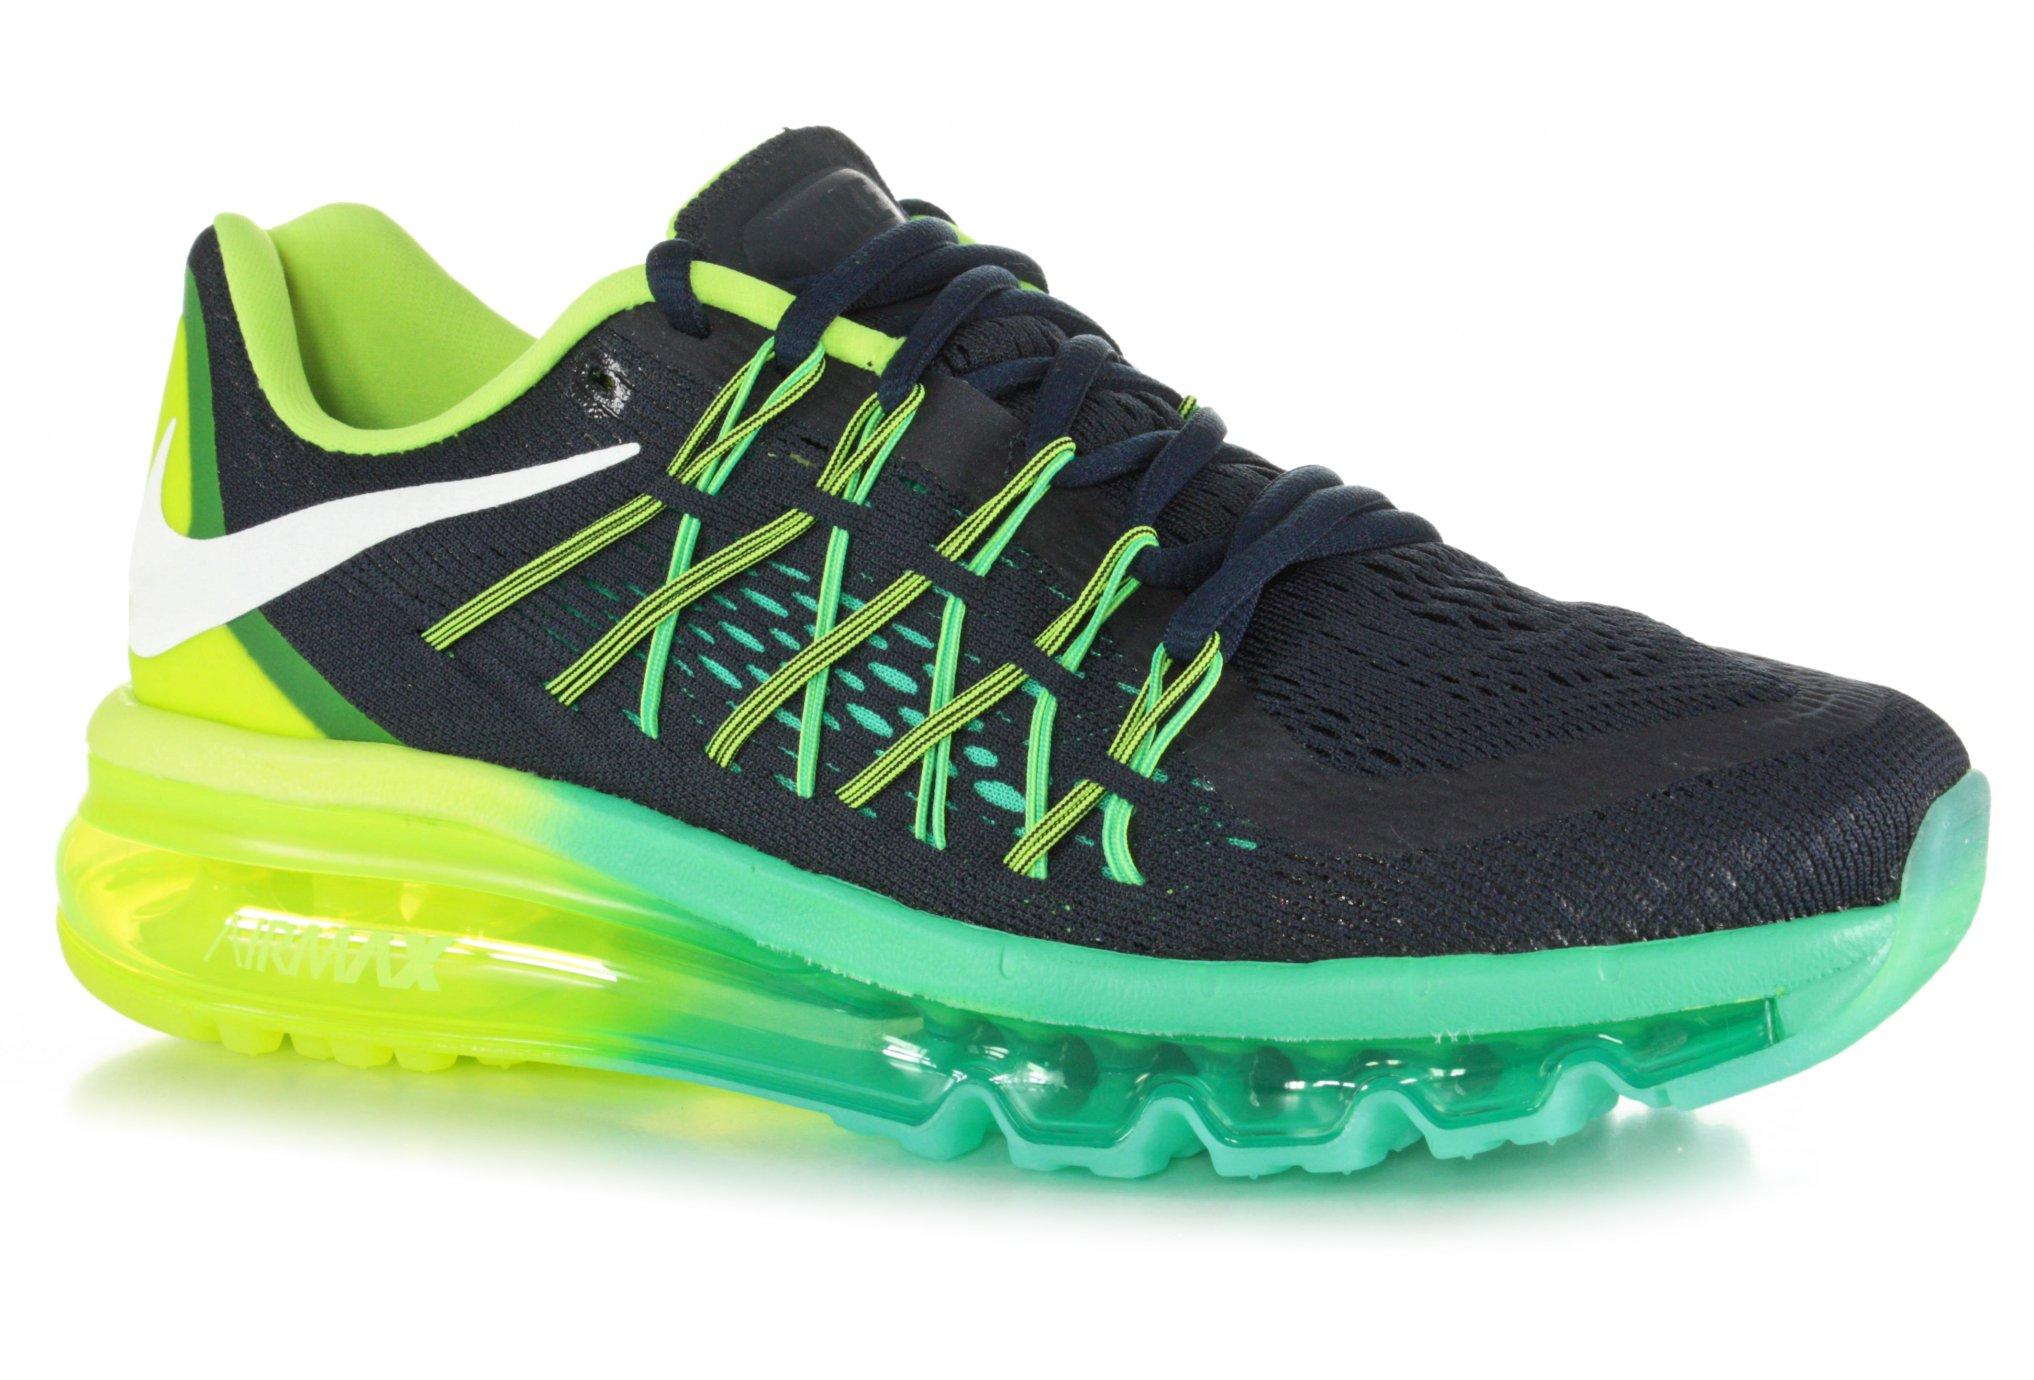 Nike pas Air Max 2015 W pas Nike cher Chaussures running femme Nike running e44313